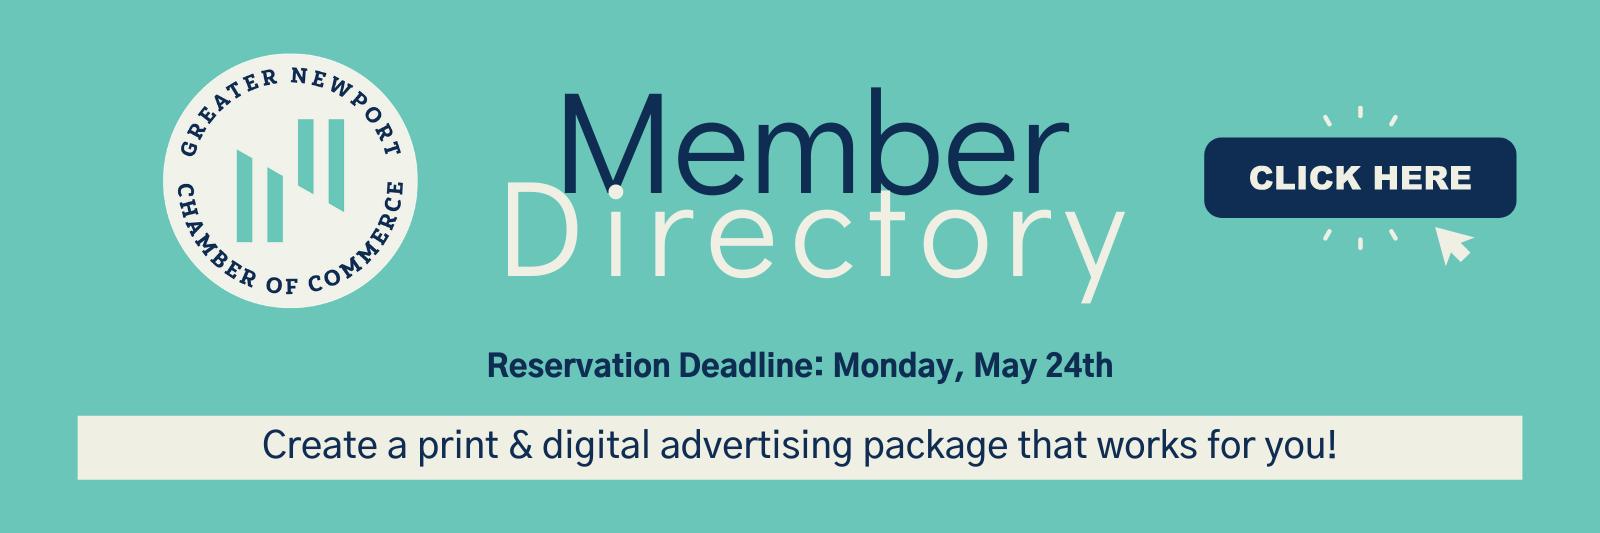 2021-Member-Directory-scrolling-image.png